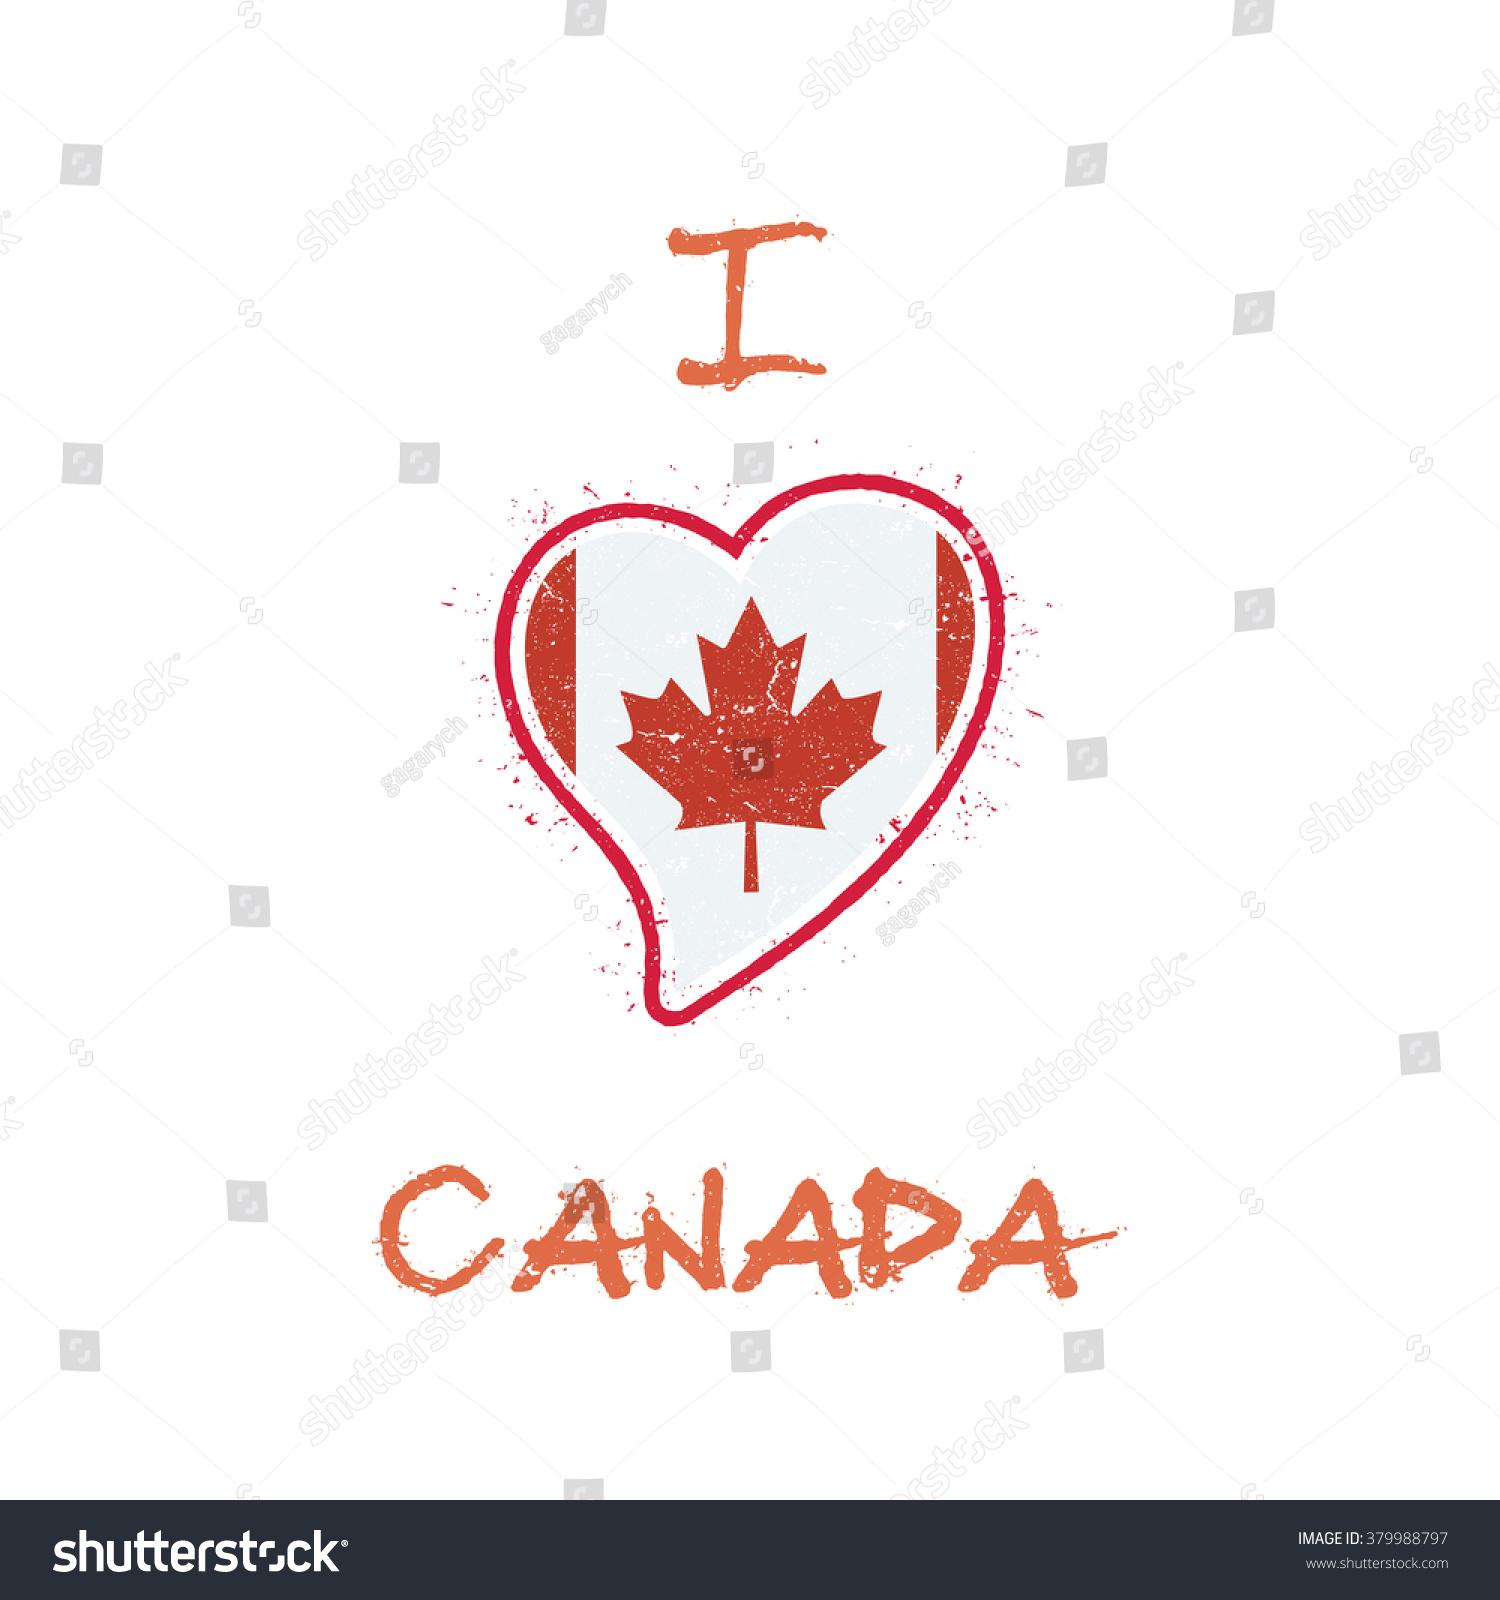 Shirt design canada - Canada Flag Patriotic T Shirt Design Heart Shaped National Flag Of Canada On White